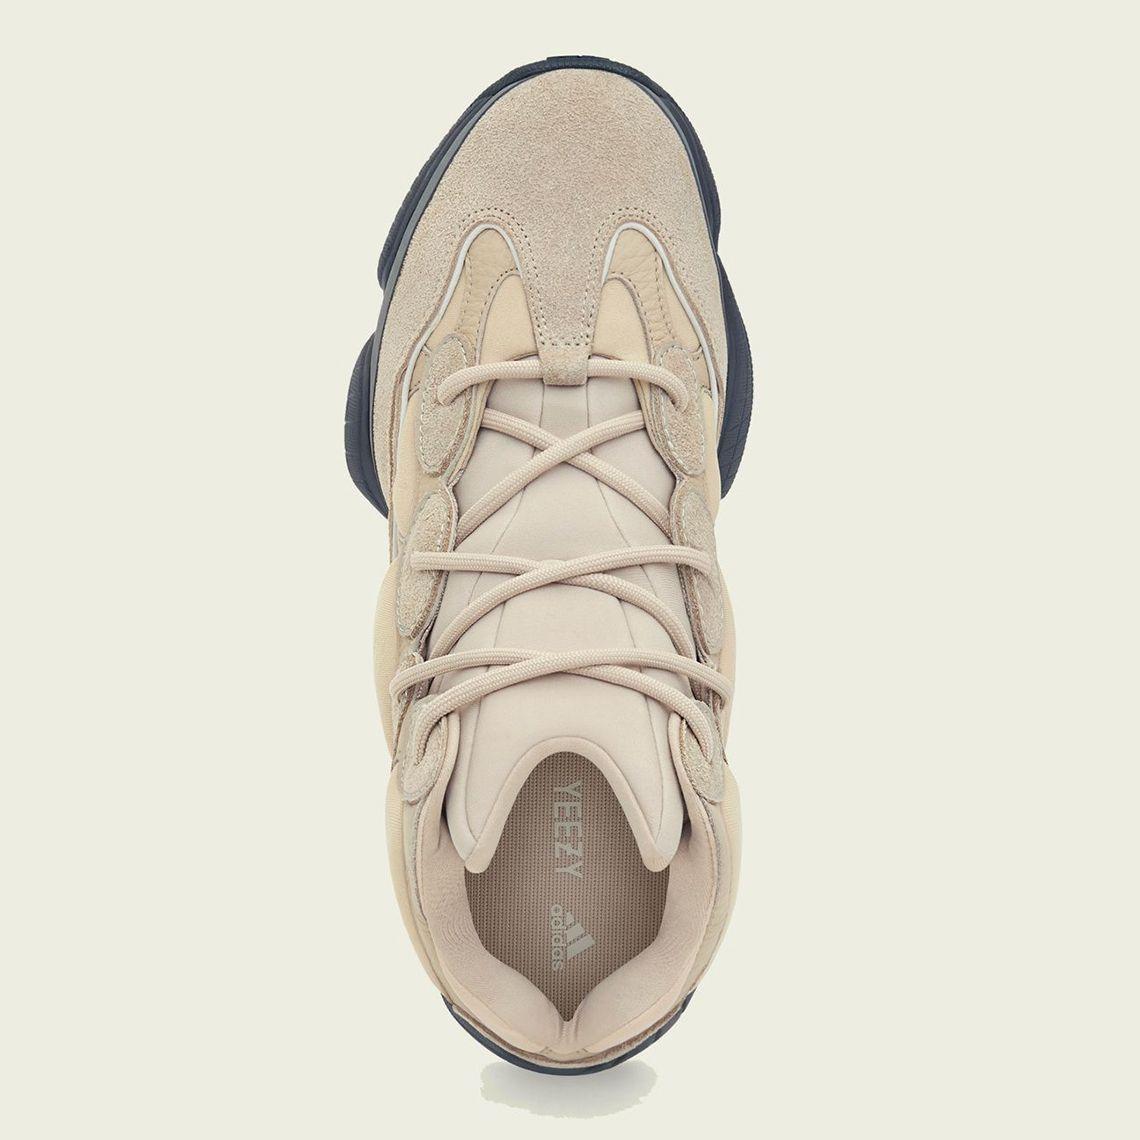 adidas Yeezy 500 High «Wakaran» - детали релиза